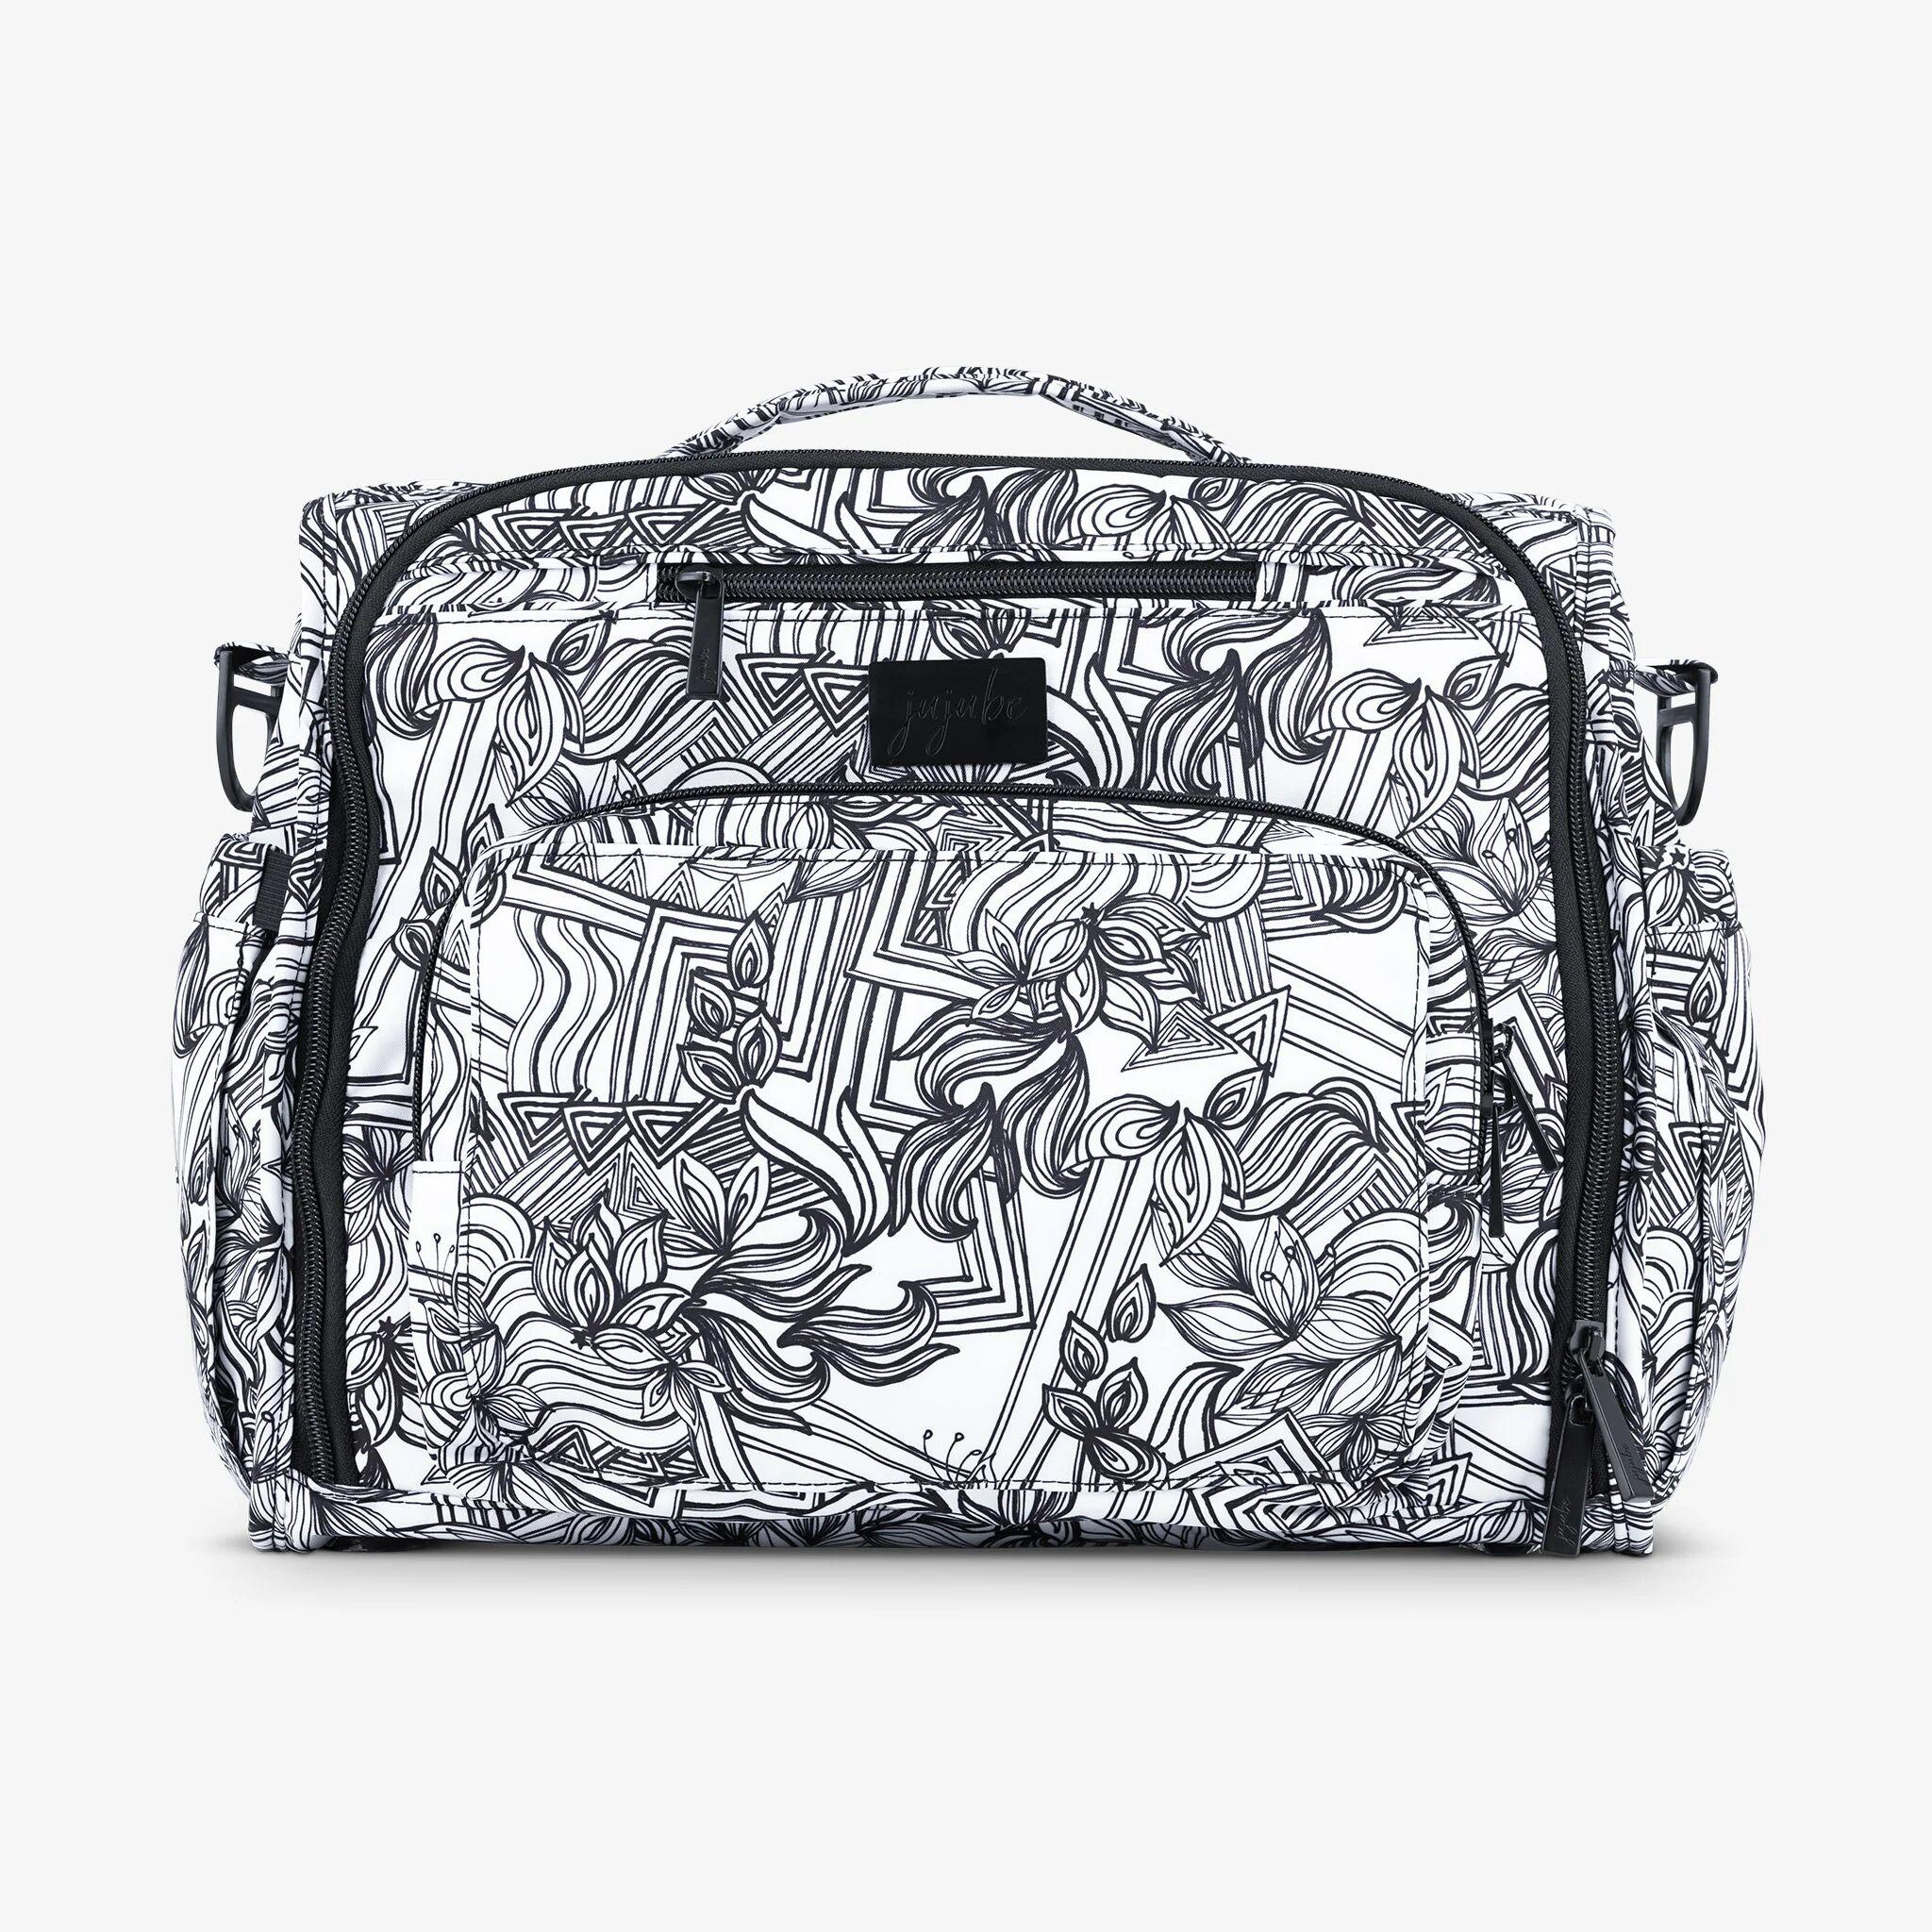 JuJuBe B.F.F. Diaper Bag - Sketch